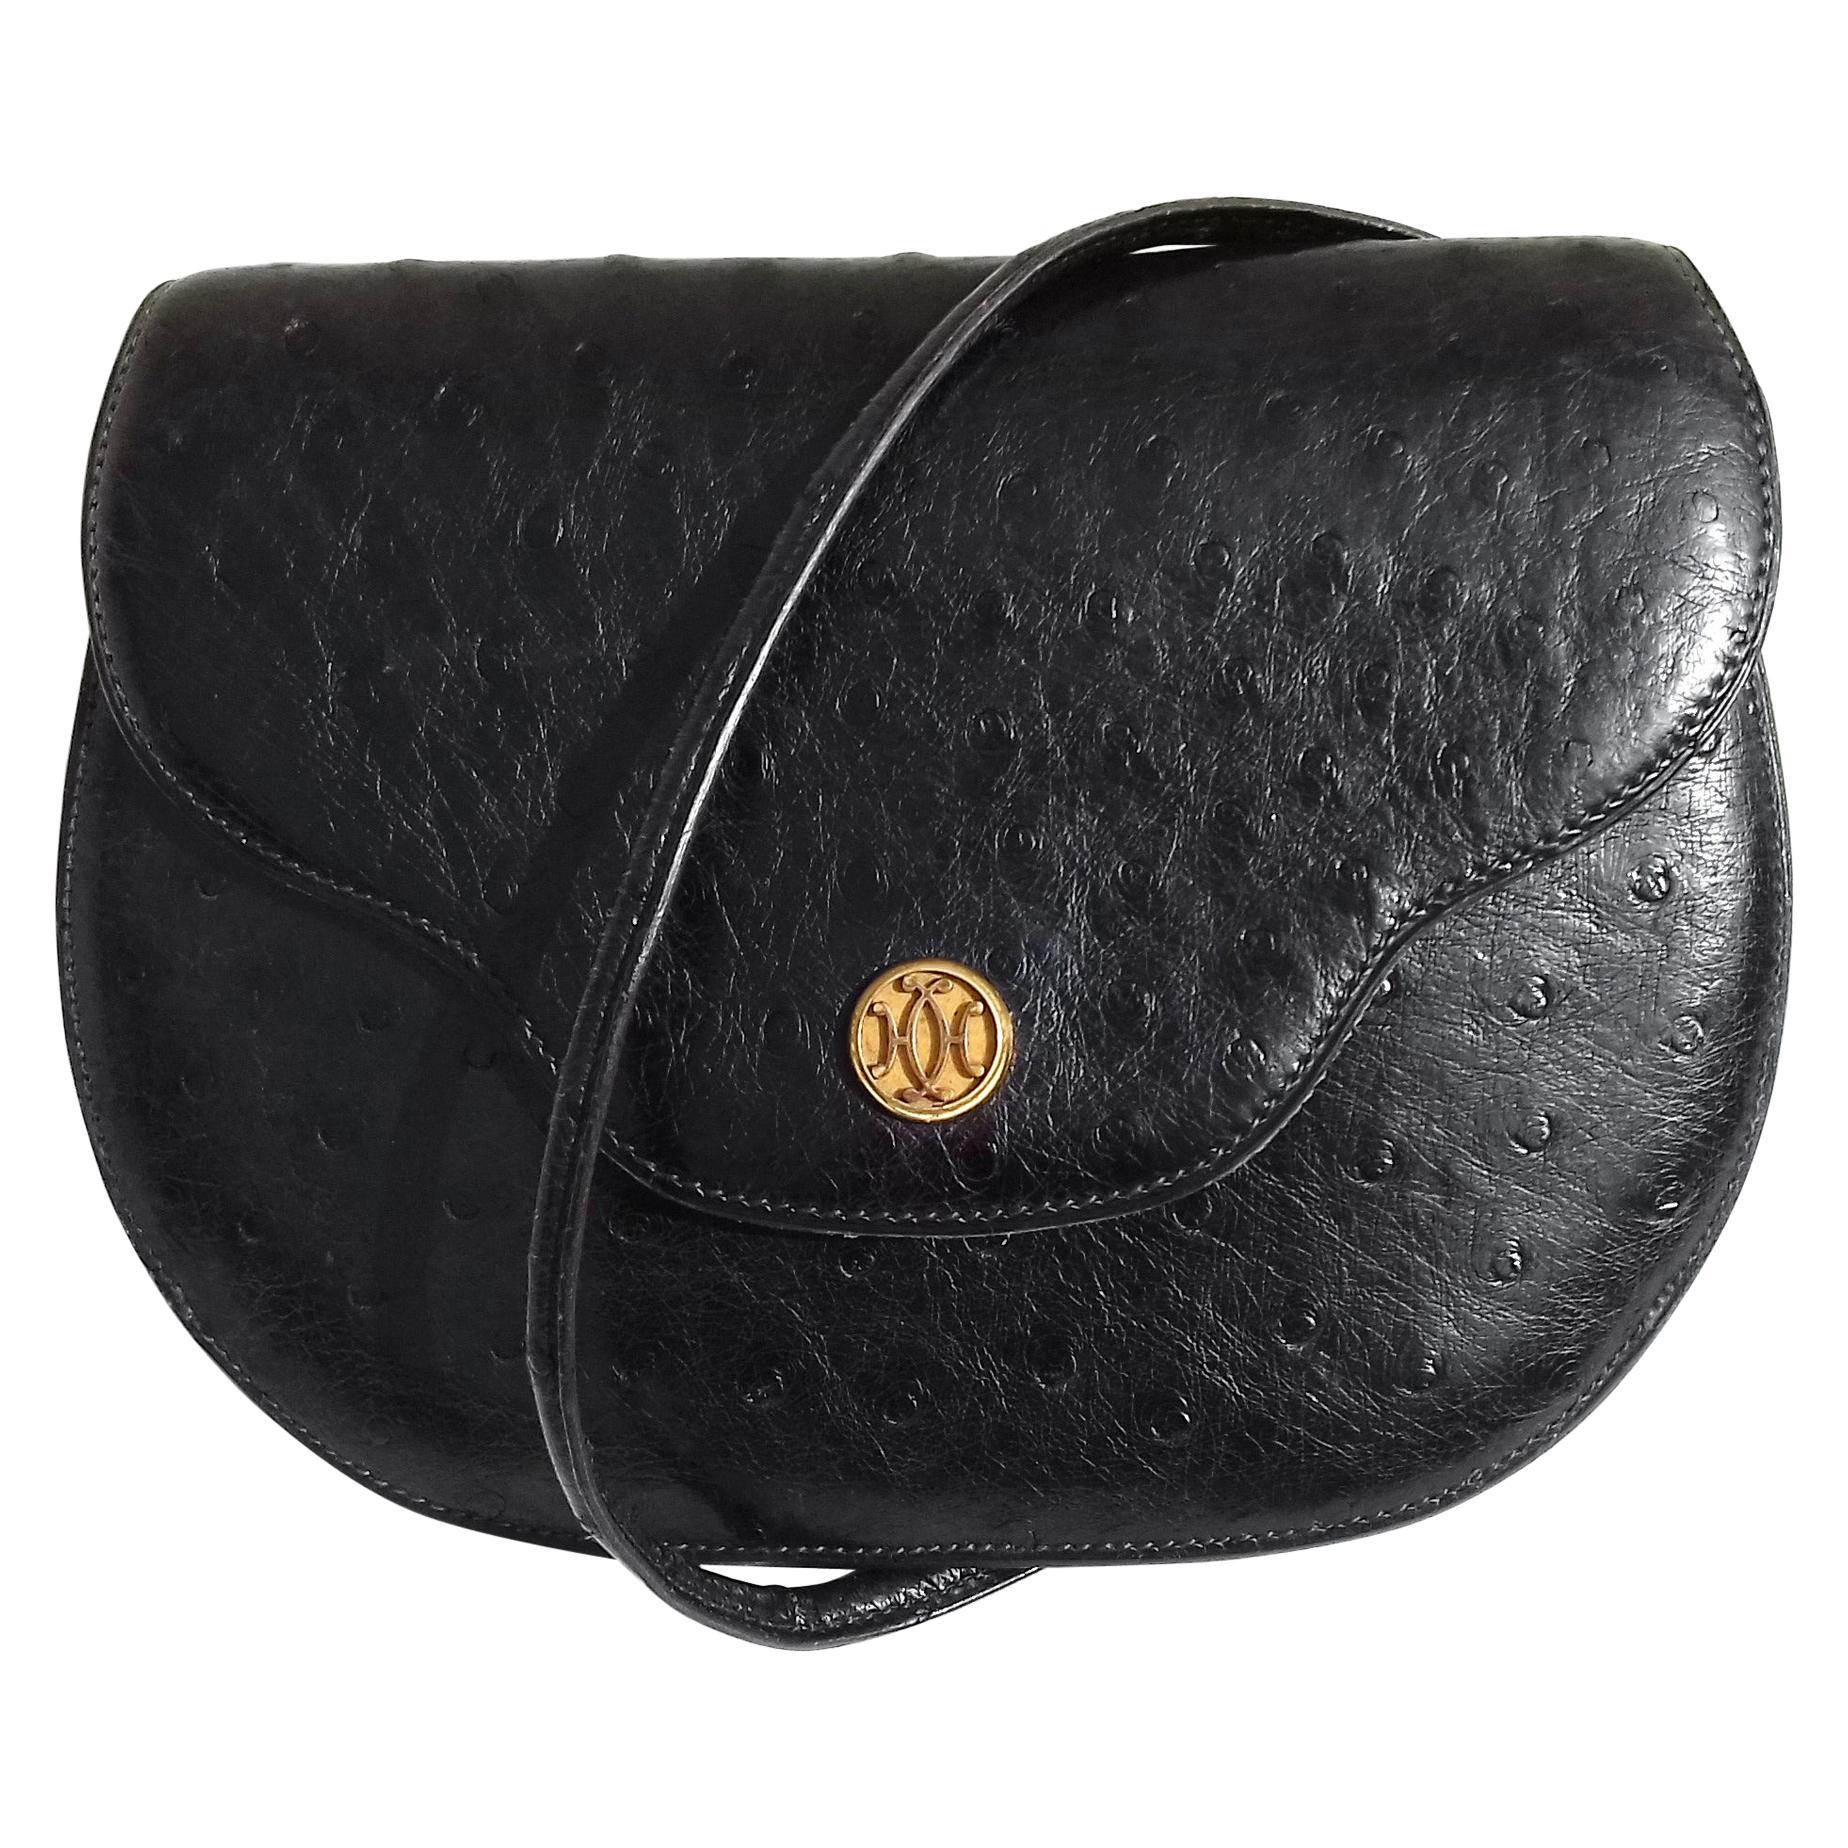 Hermès Vintage Pola Purse Clutch Evening Bag 2 ways Black Ostrich Golden Hdw